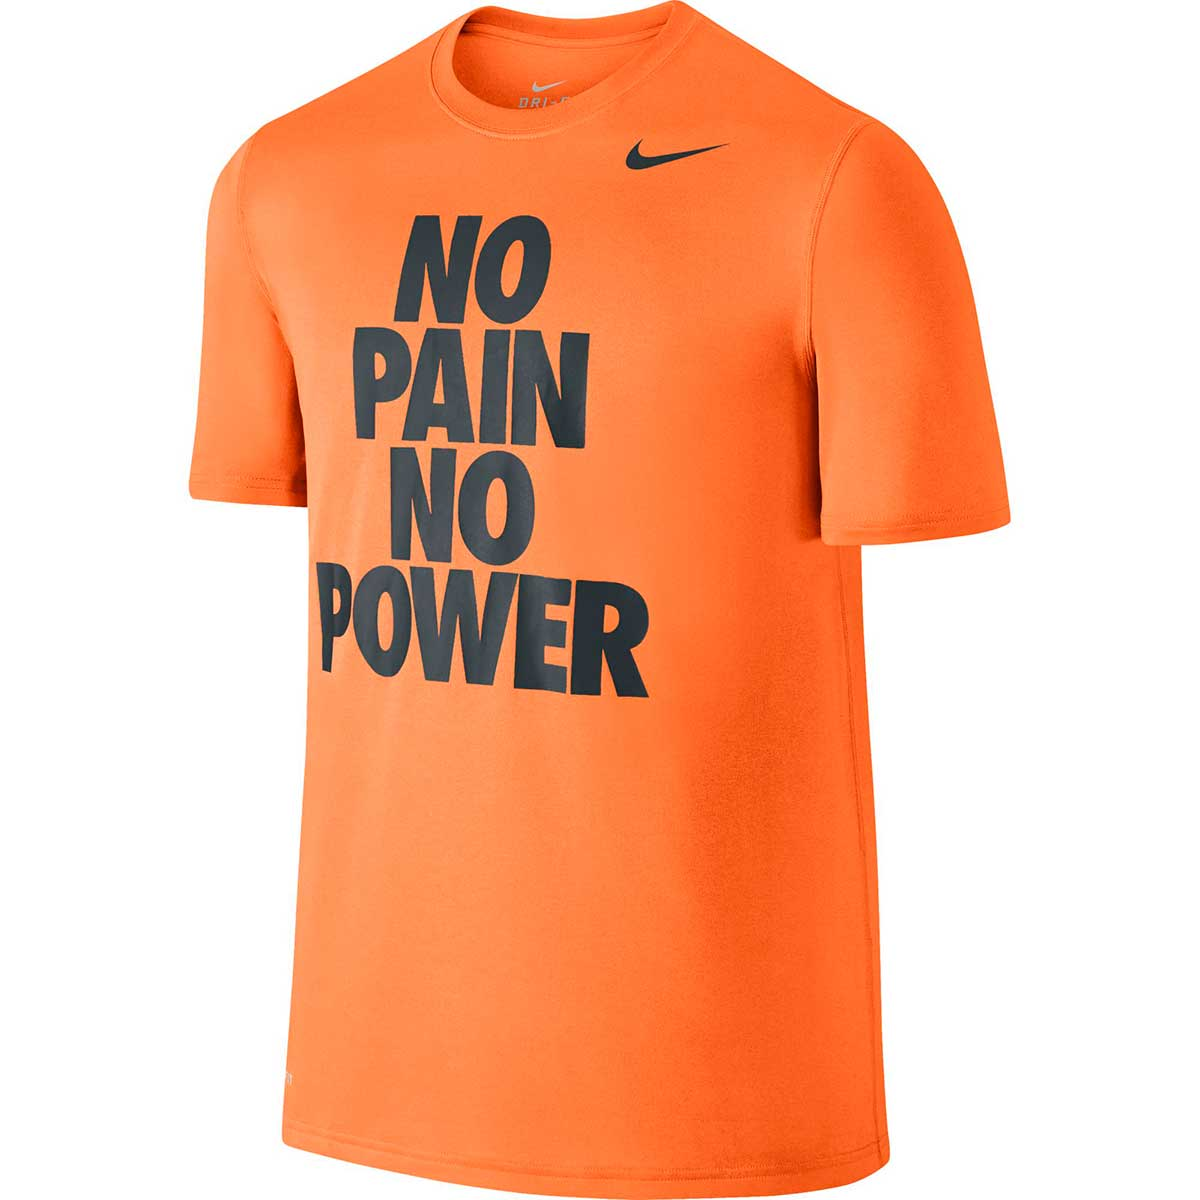 Nike dri fit bulk order for Order custom t shirts in bulk